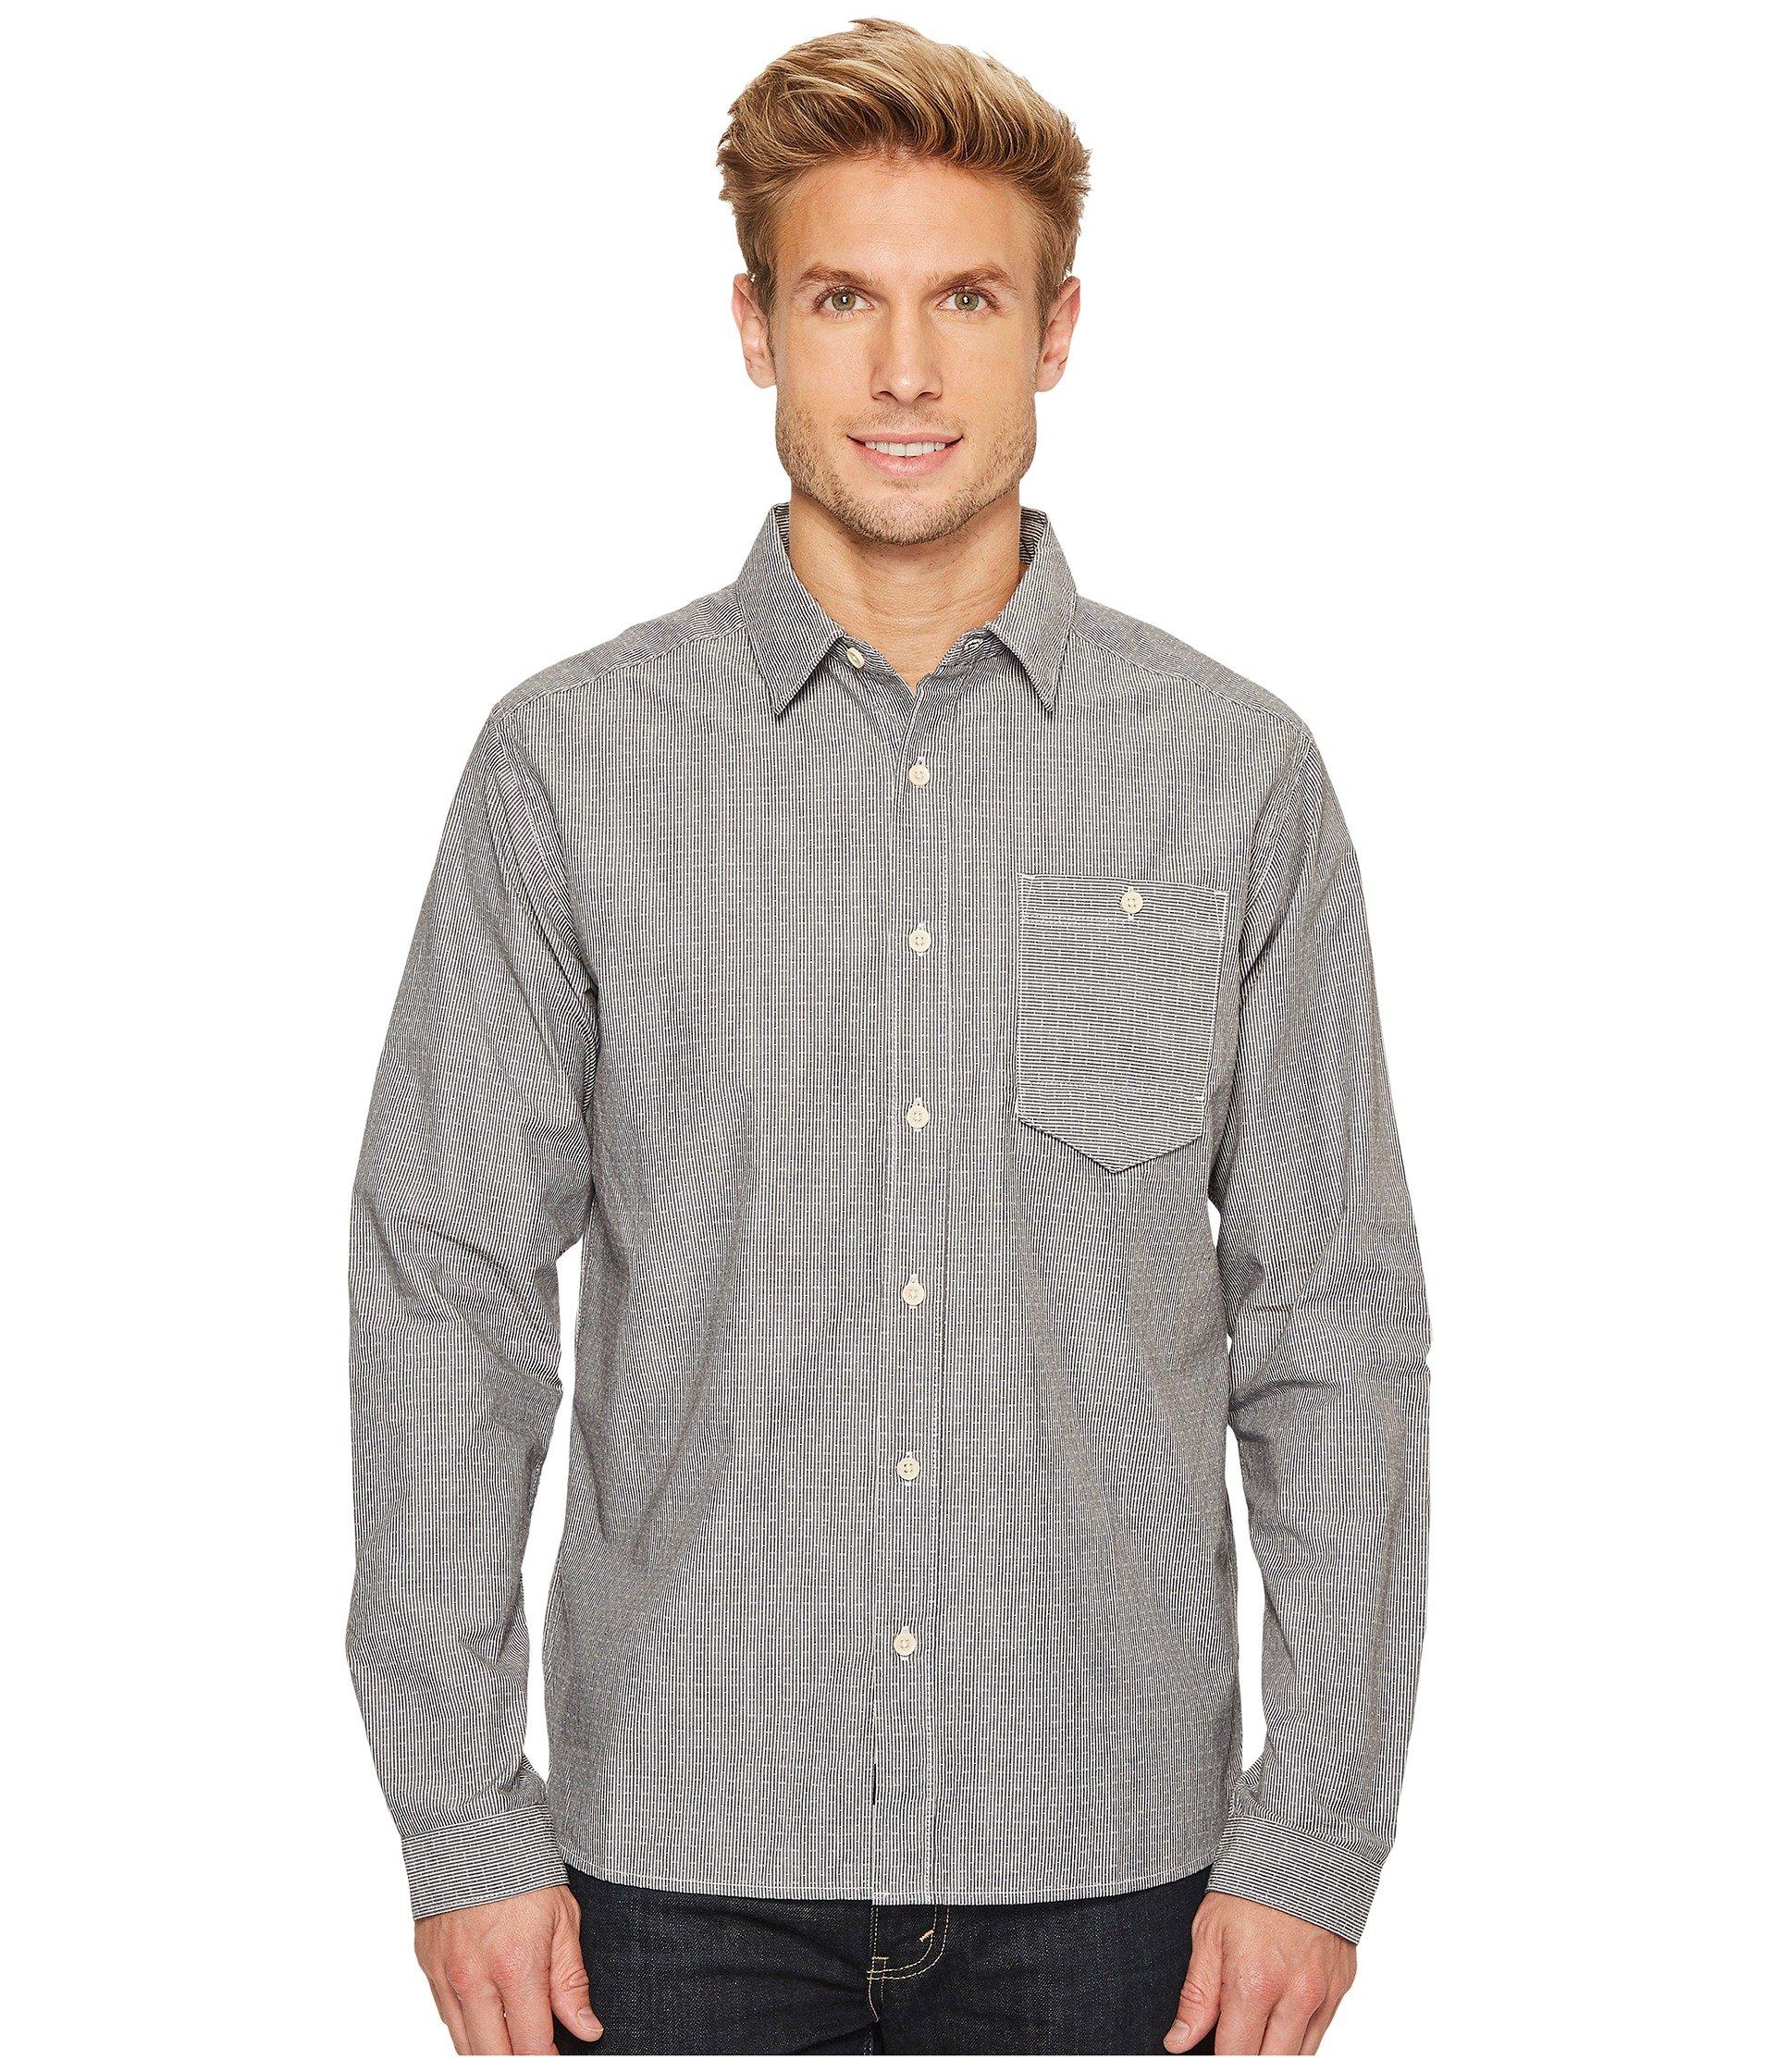 MOUNTAIN HARDWEAR Foreman Long Sleeve Shirt, Black